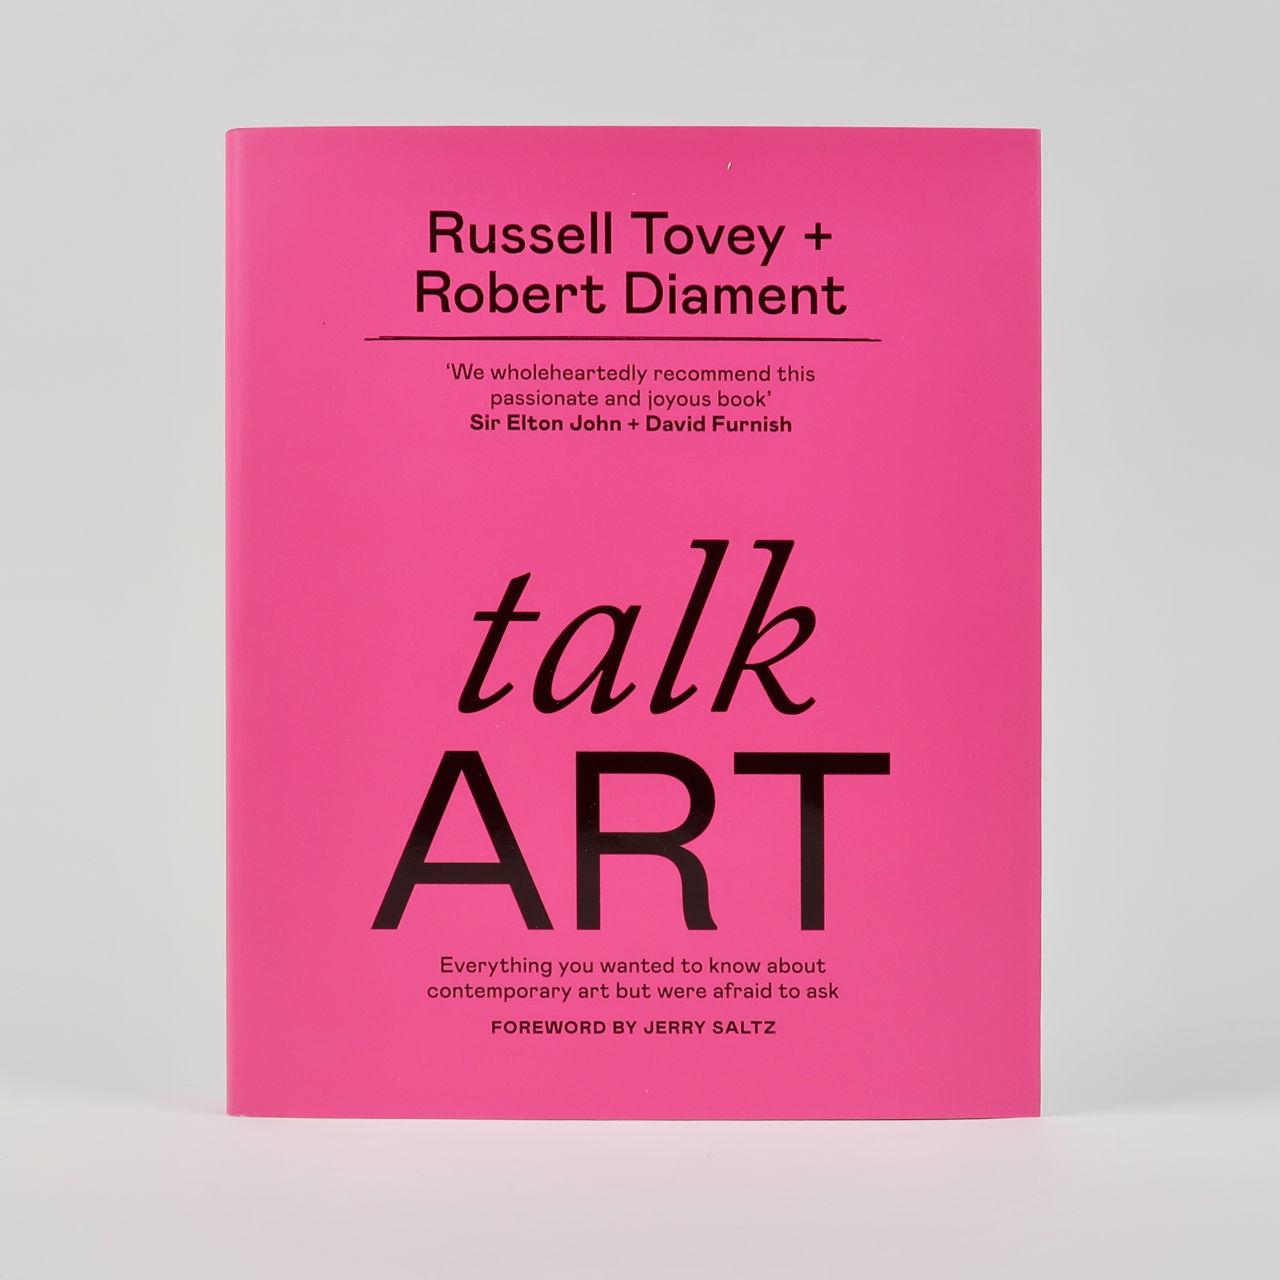 Talk Art - Russell Tovey & Robert Diament